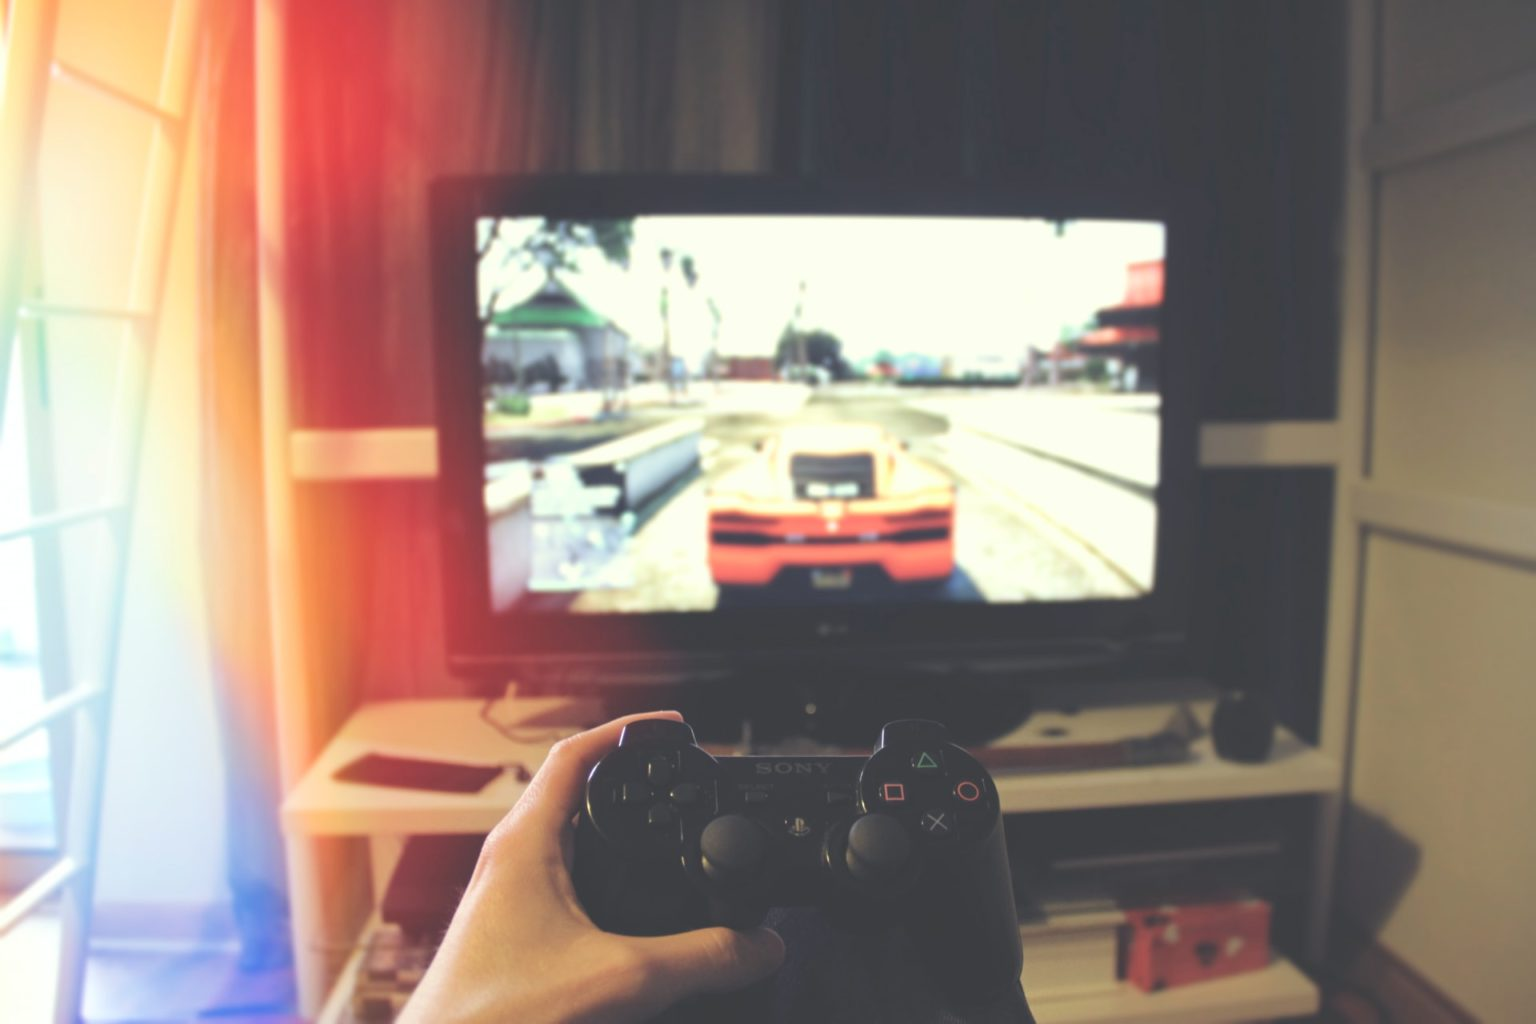 Do Video Games Promote Violence